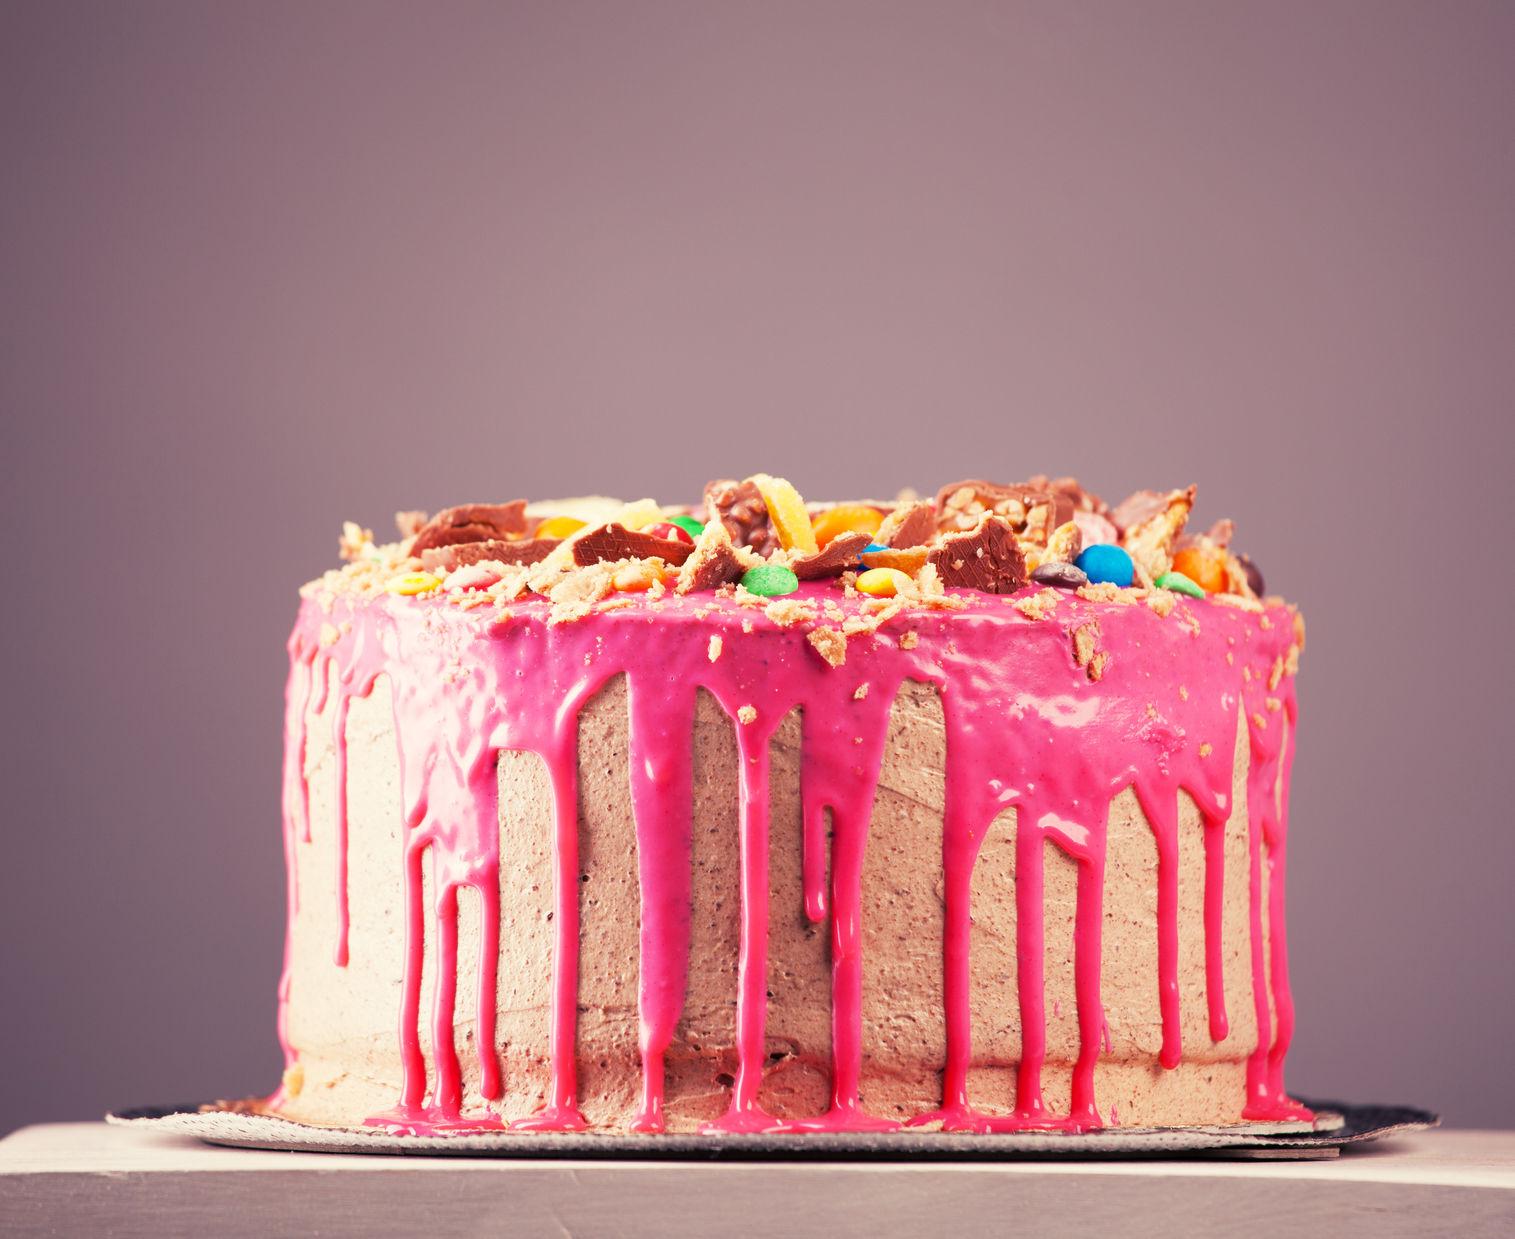 45284084 - beautiful big pink cake. birthday cake